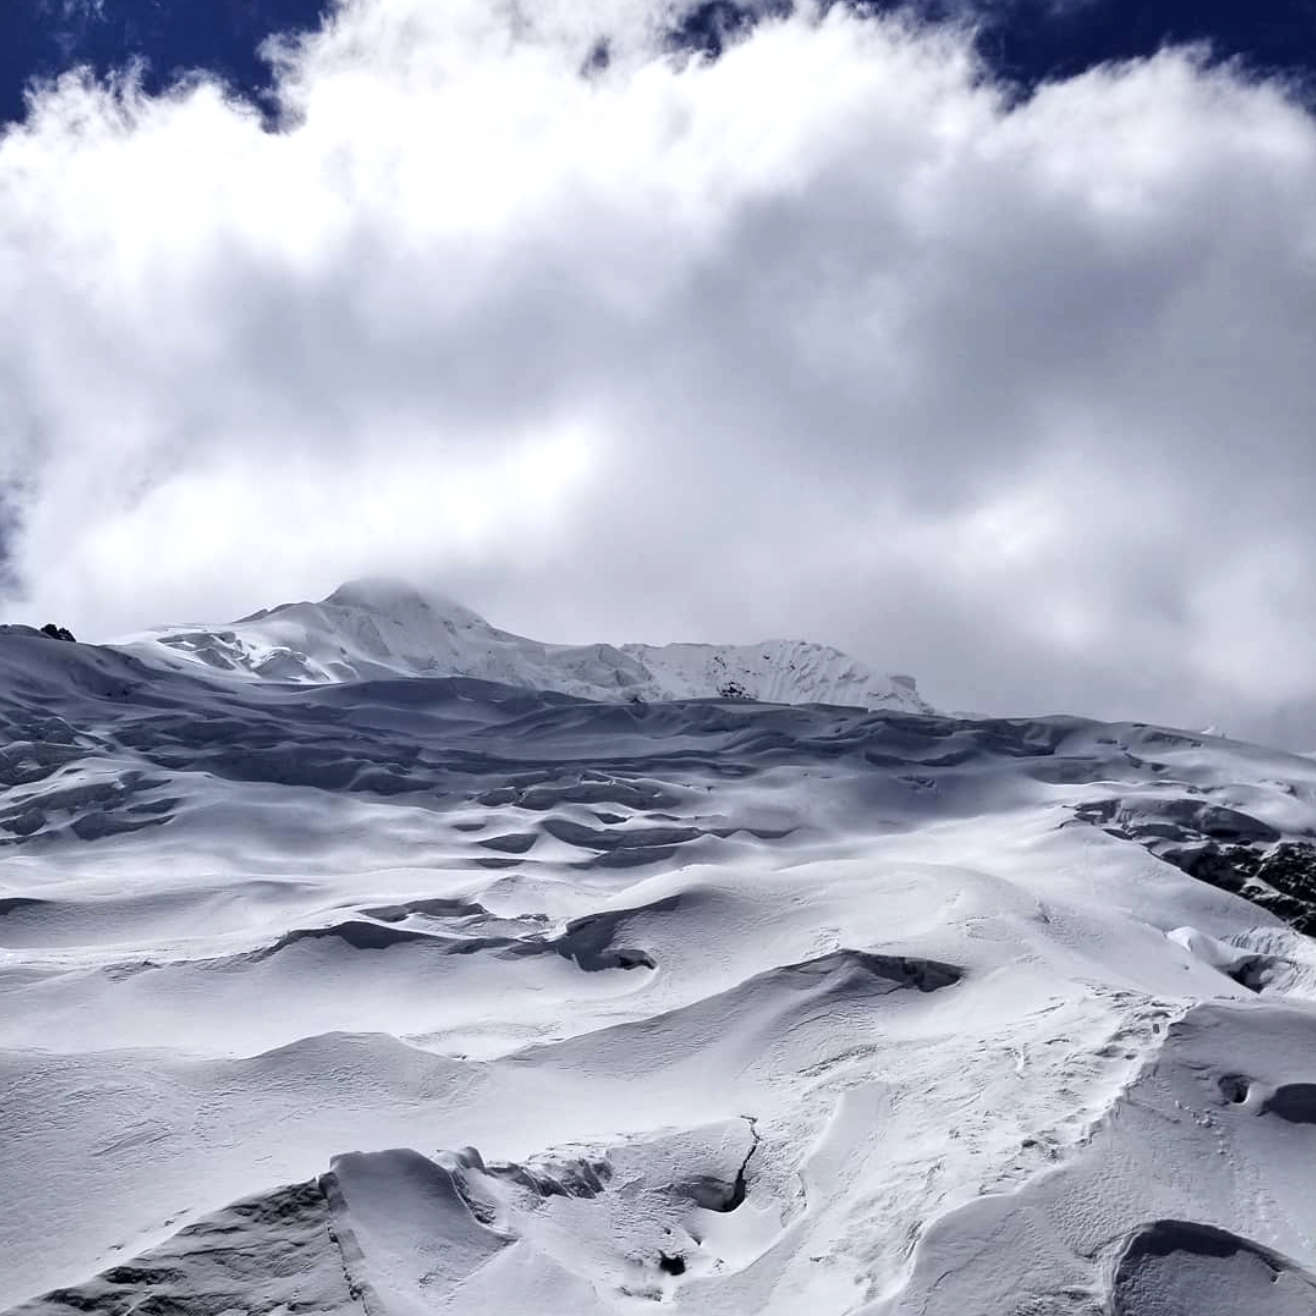 Glacier views near Project Huancayo, Peru.